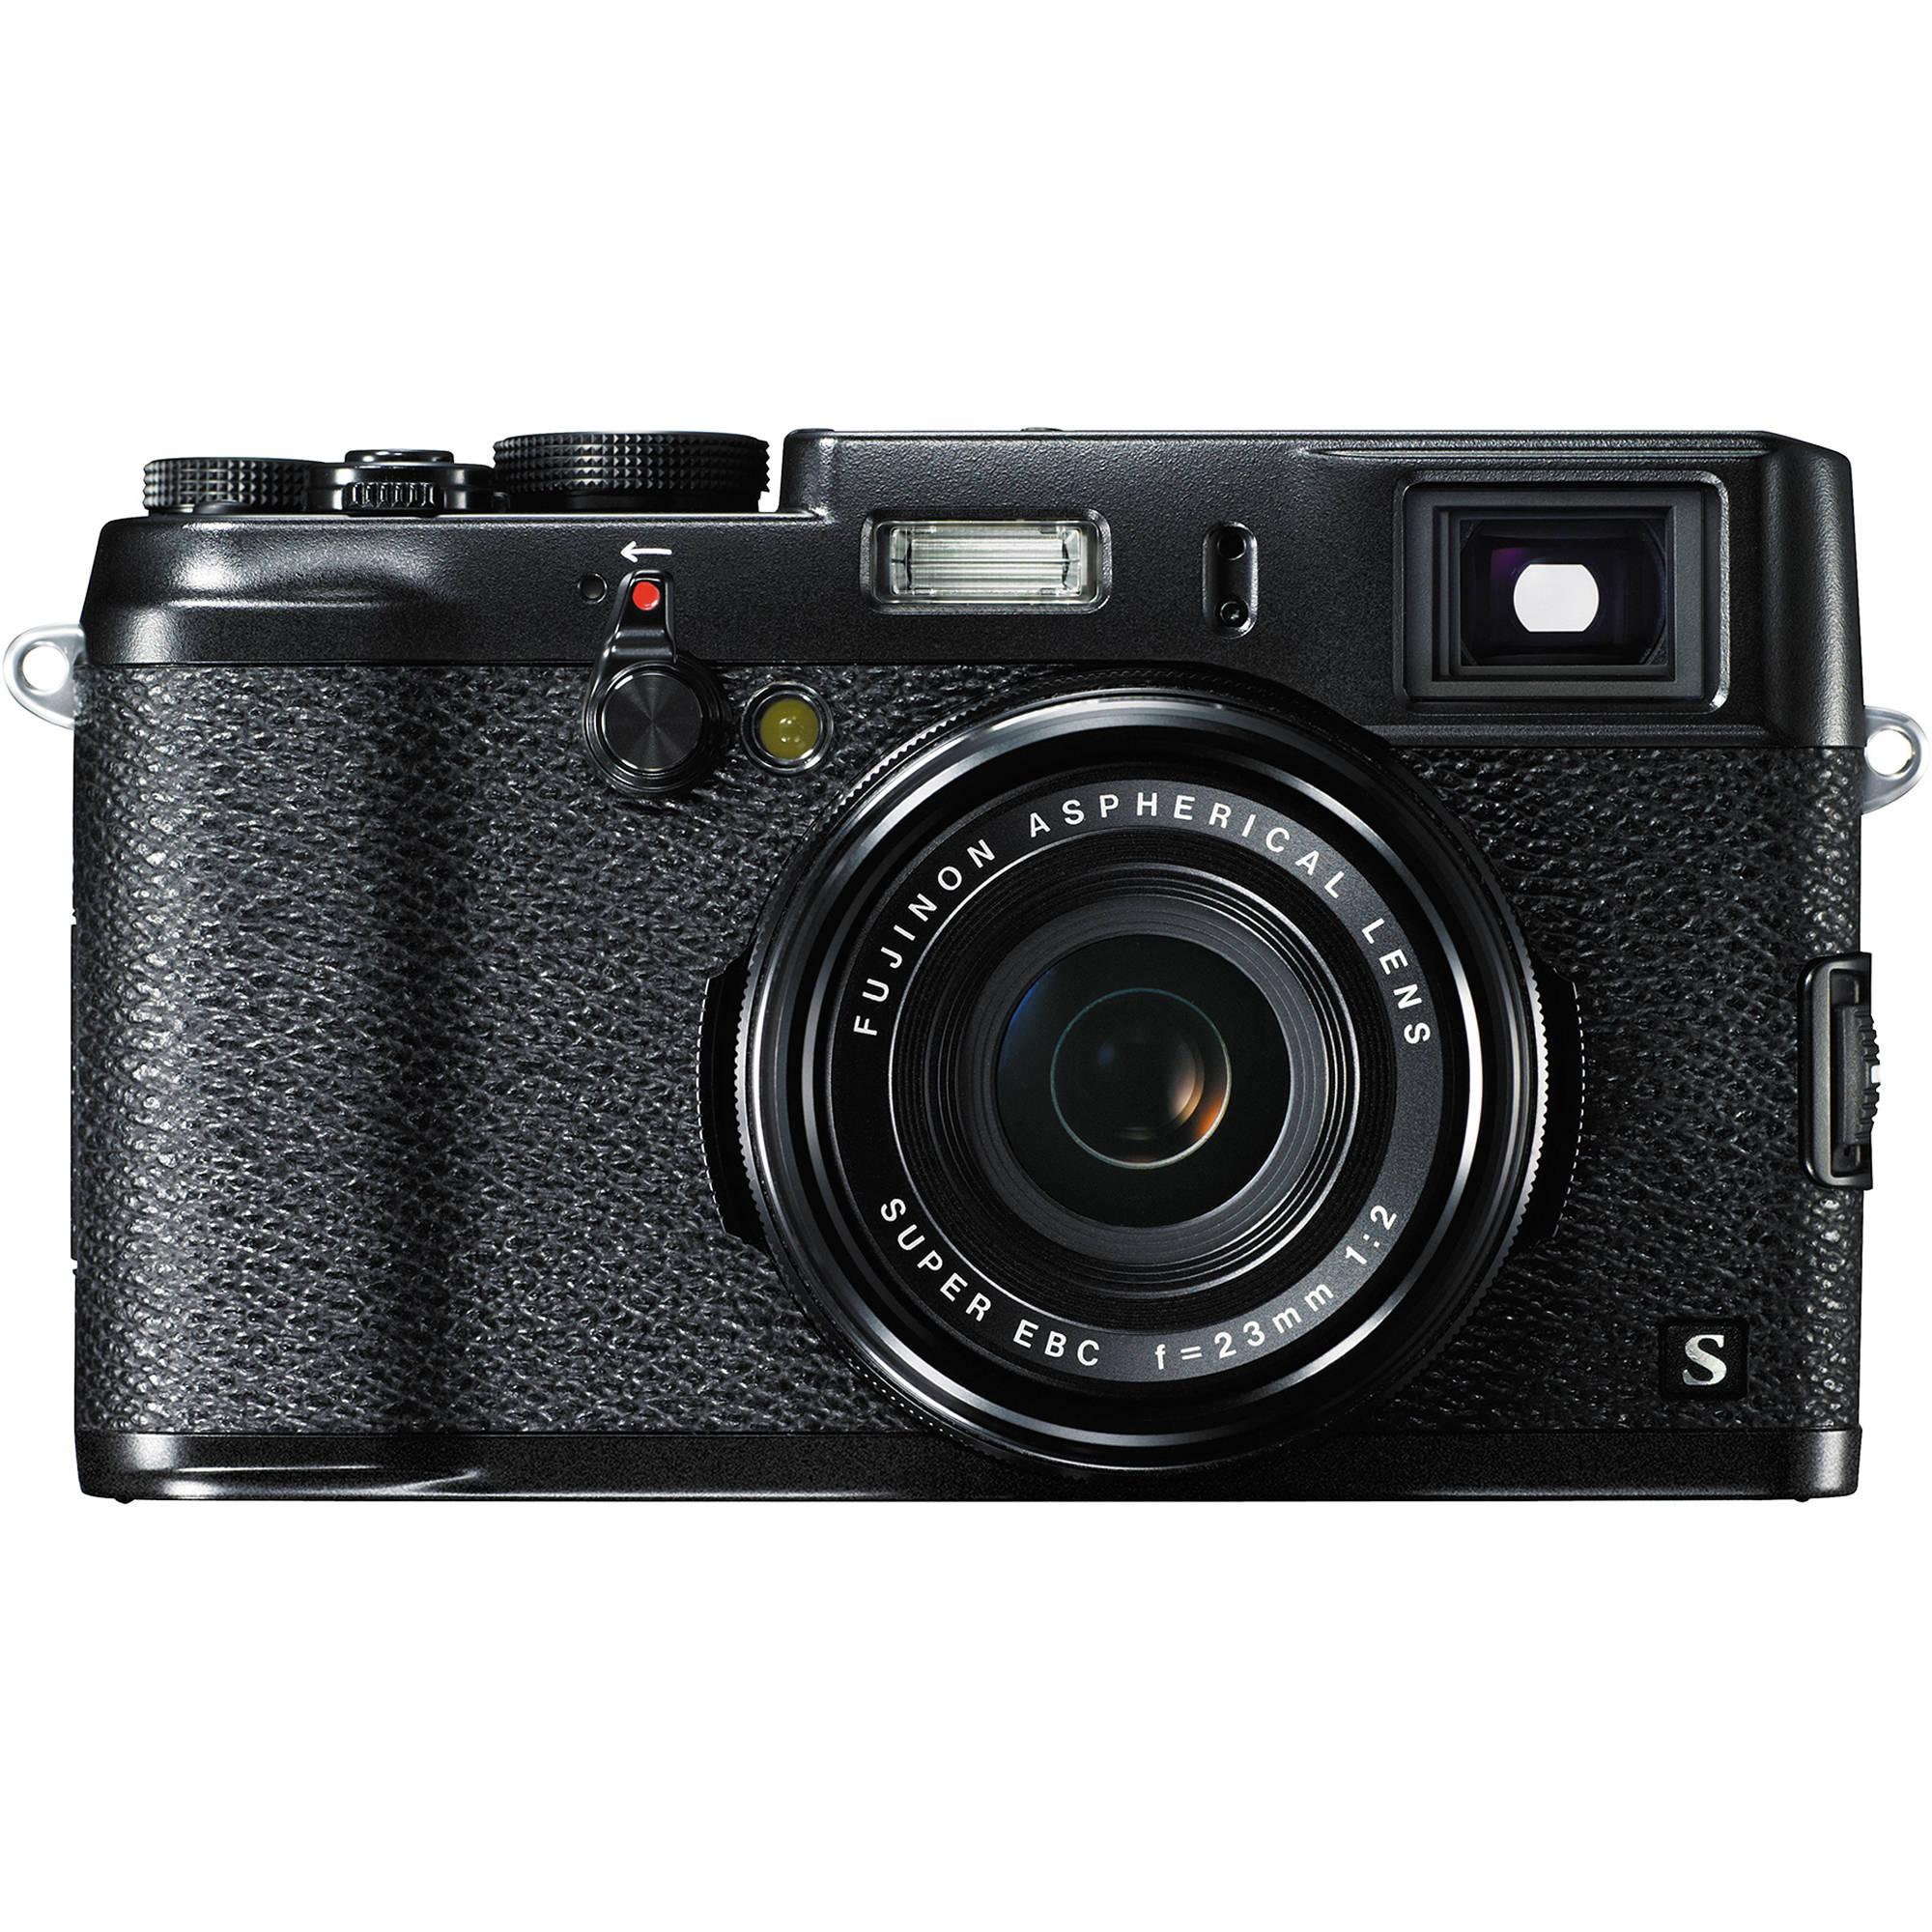 Fuji Digital Cameras: FUJIFILM X100S Digital Camera (Black) 16416445 B&H Photo Video